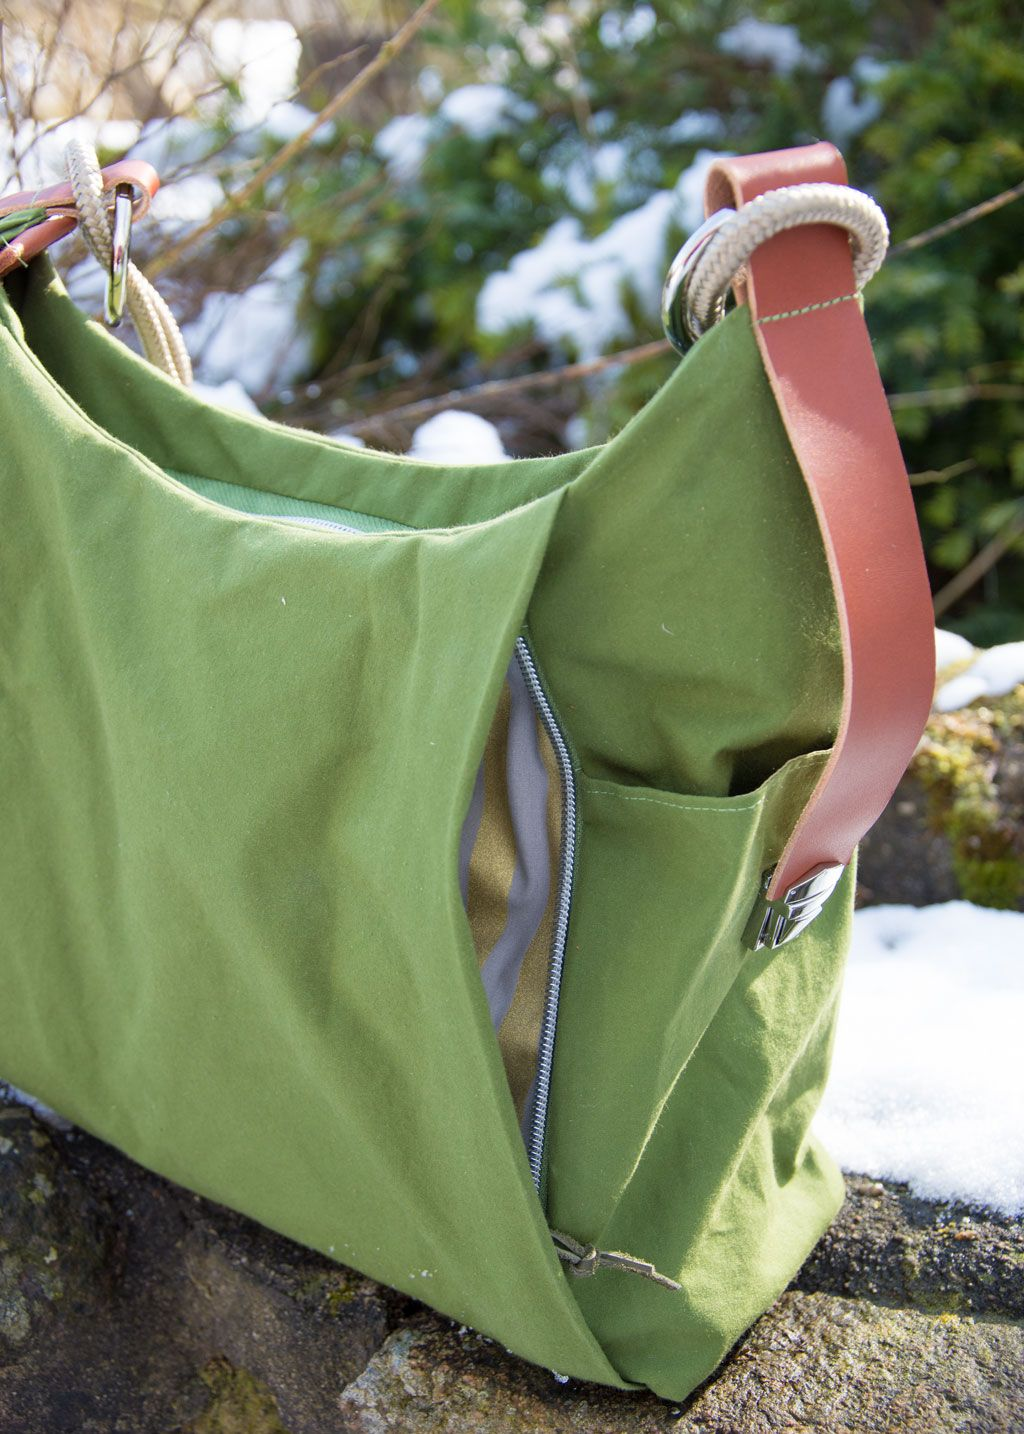 the perfect match - Tasche Dany und Oilskin - kreamino